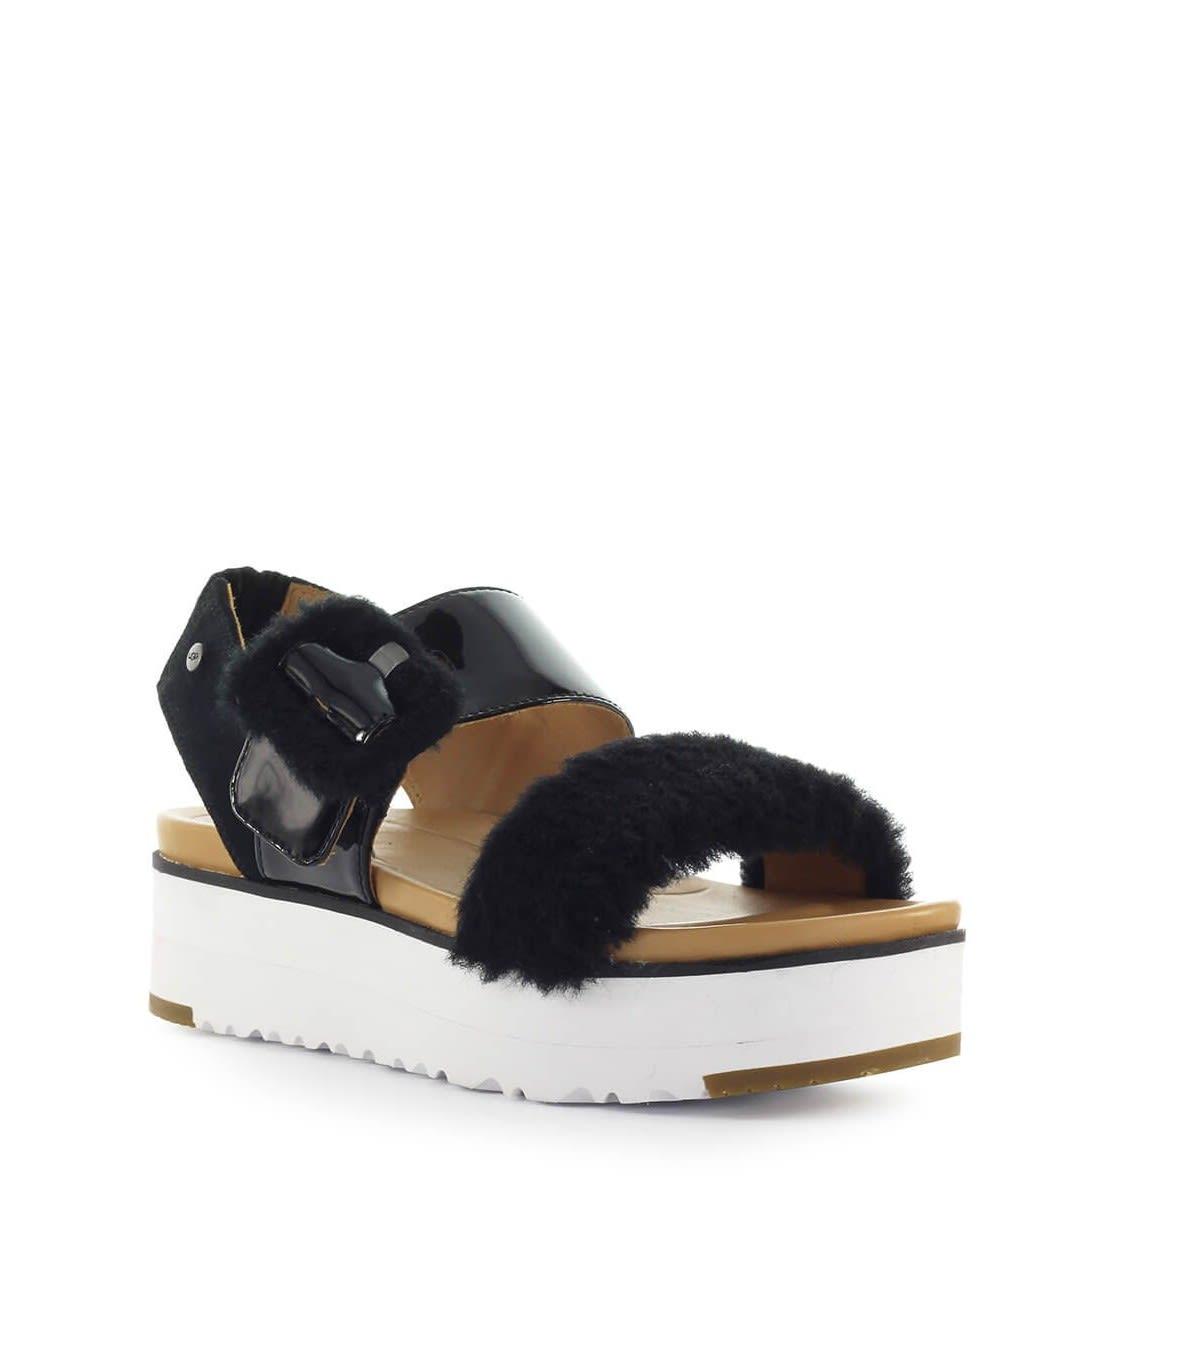 UGG Women's Fluff Chella Flatform Sandals Black